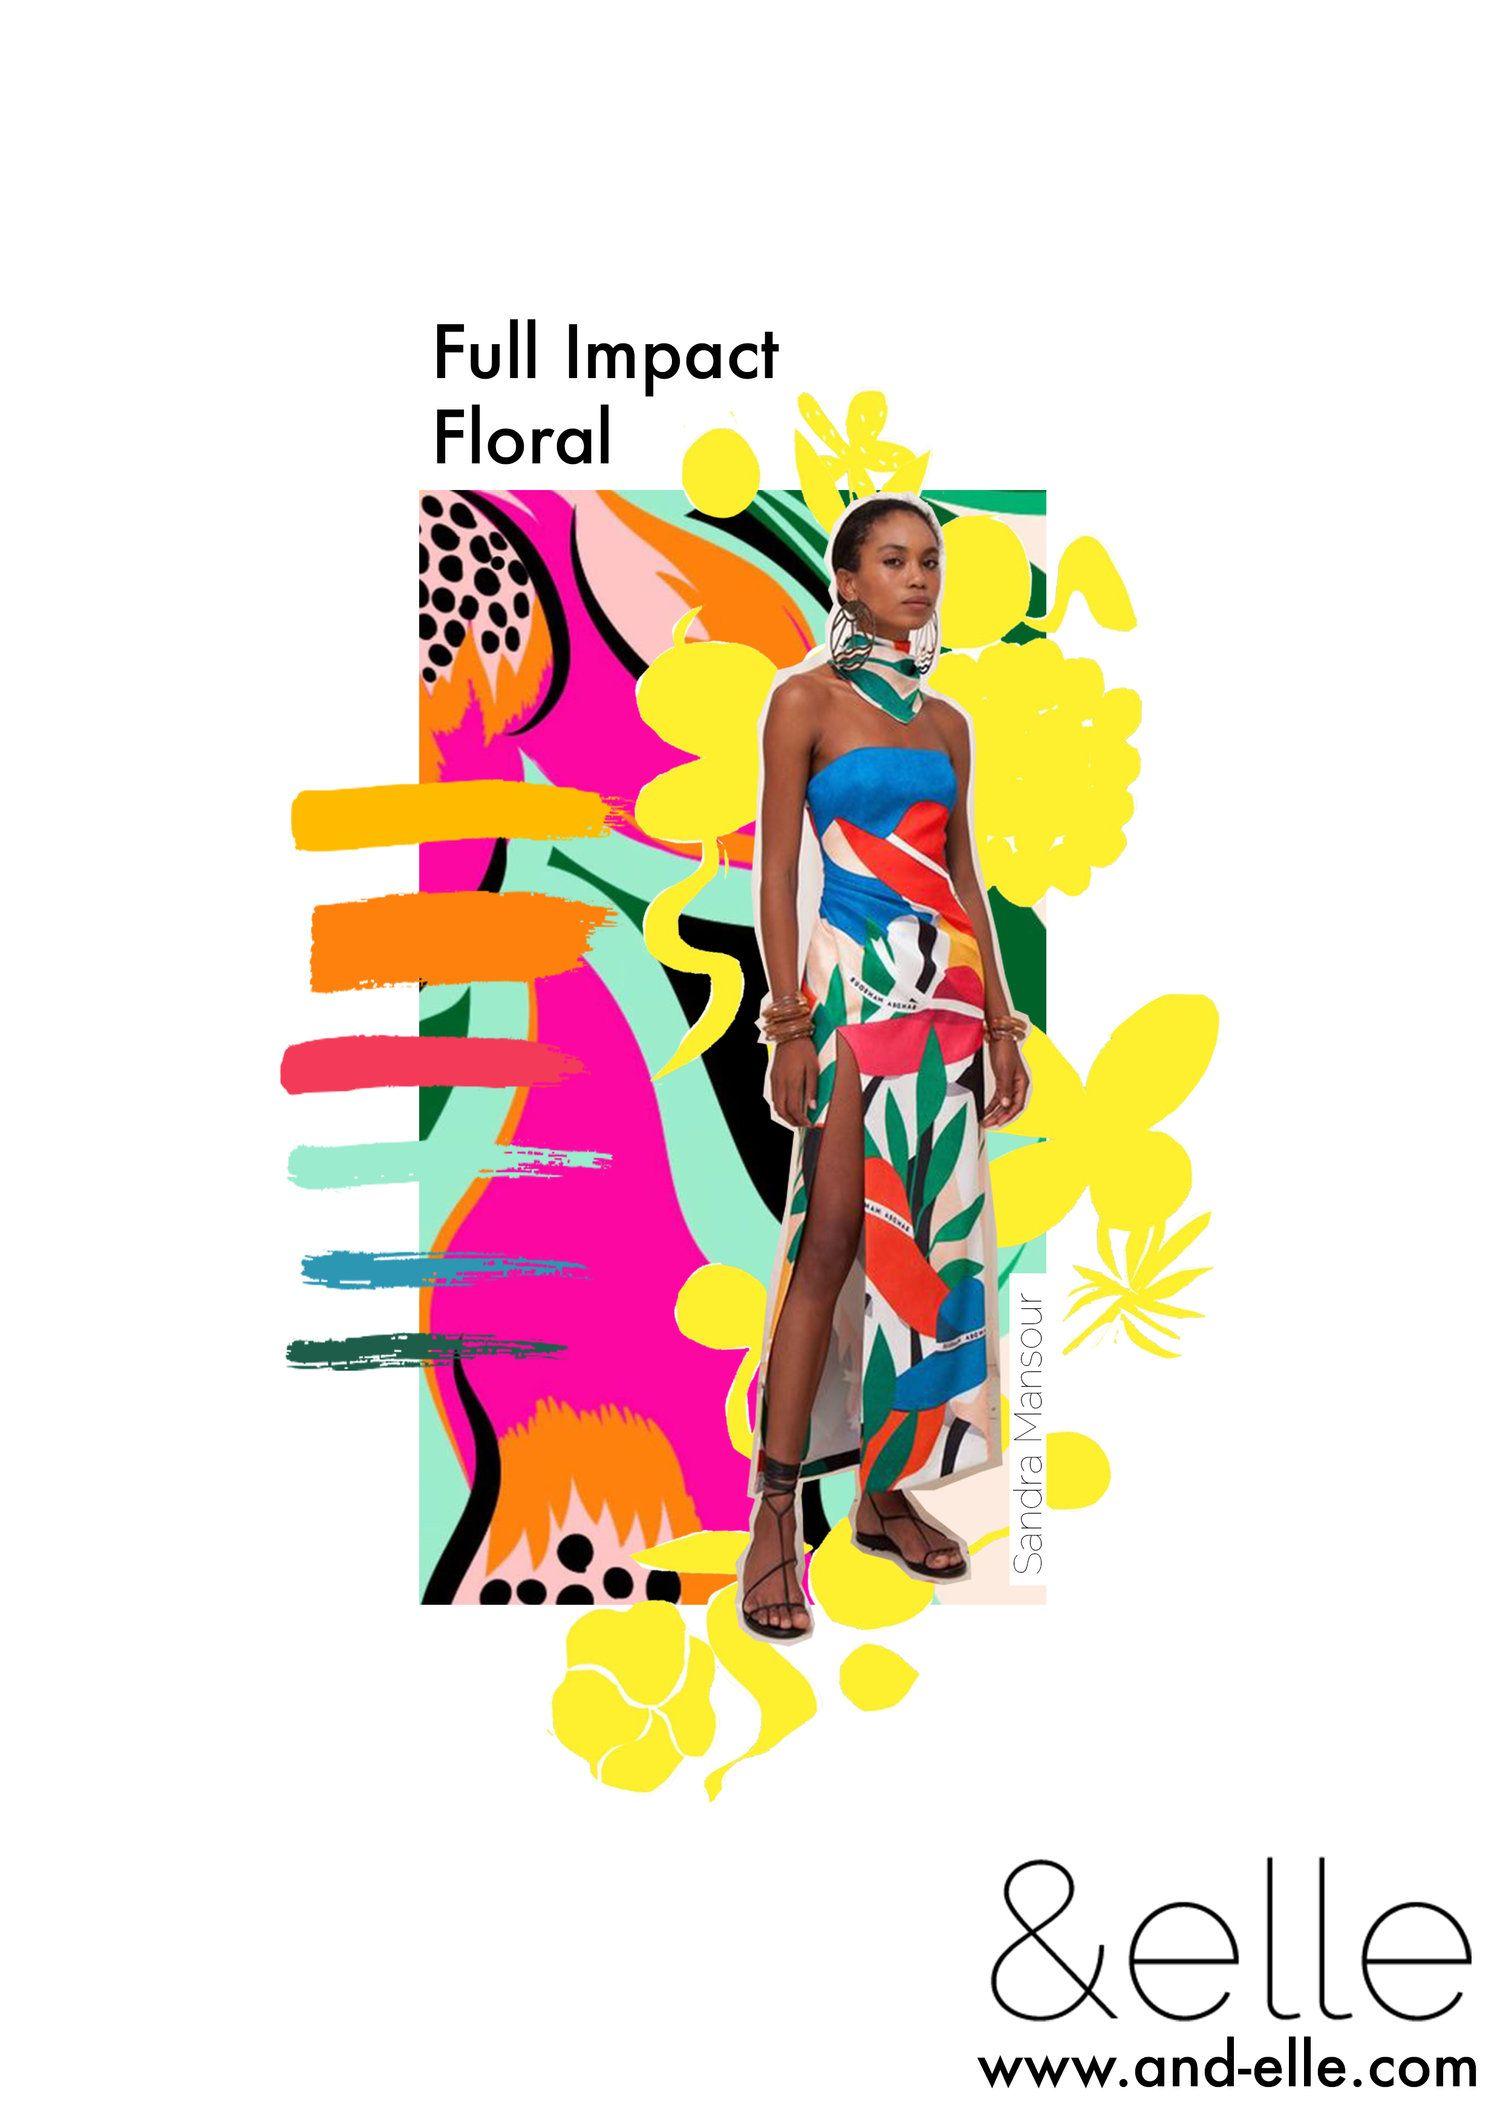 &elle — Full Impact Flora Fashion trending moodboard